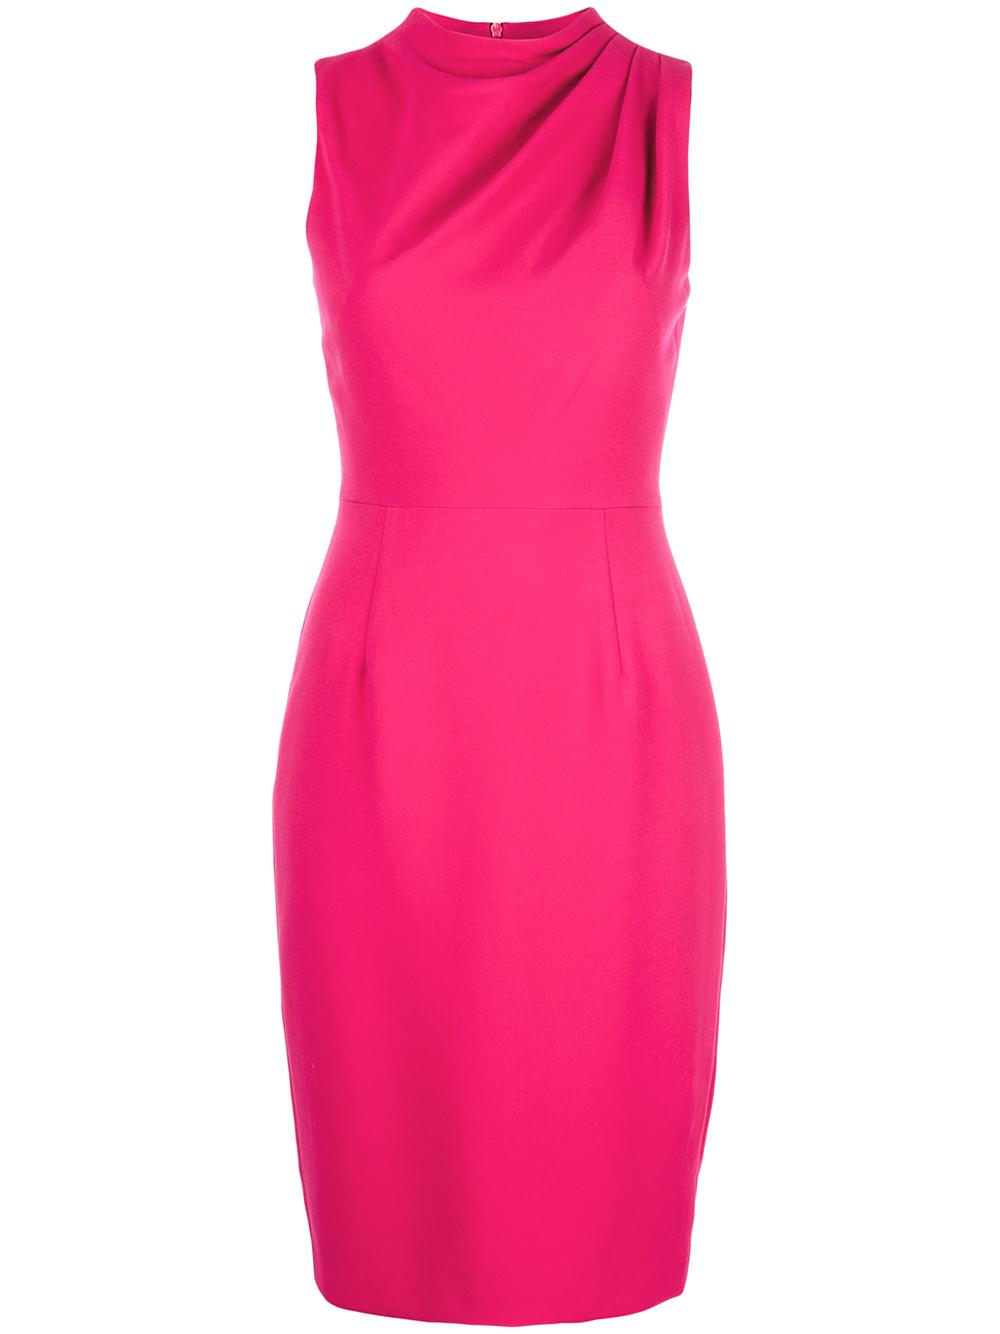 Corrine Sheath Dress Item # 3592202-F19